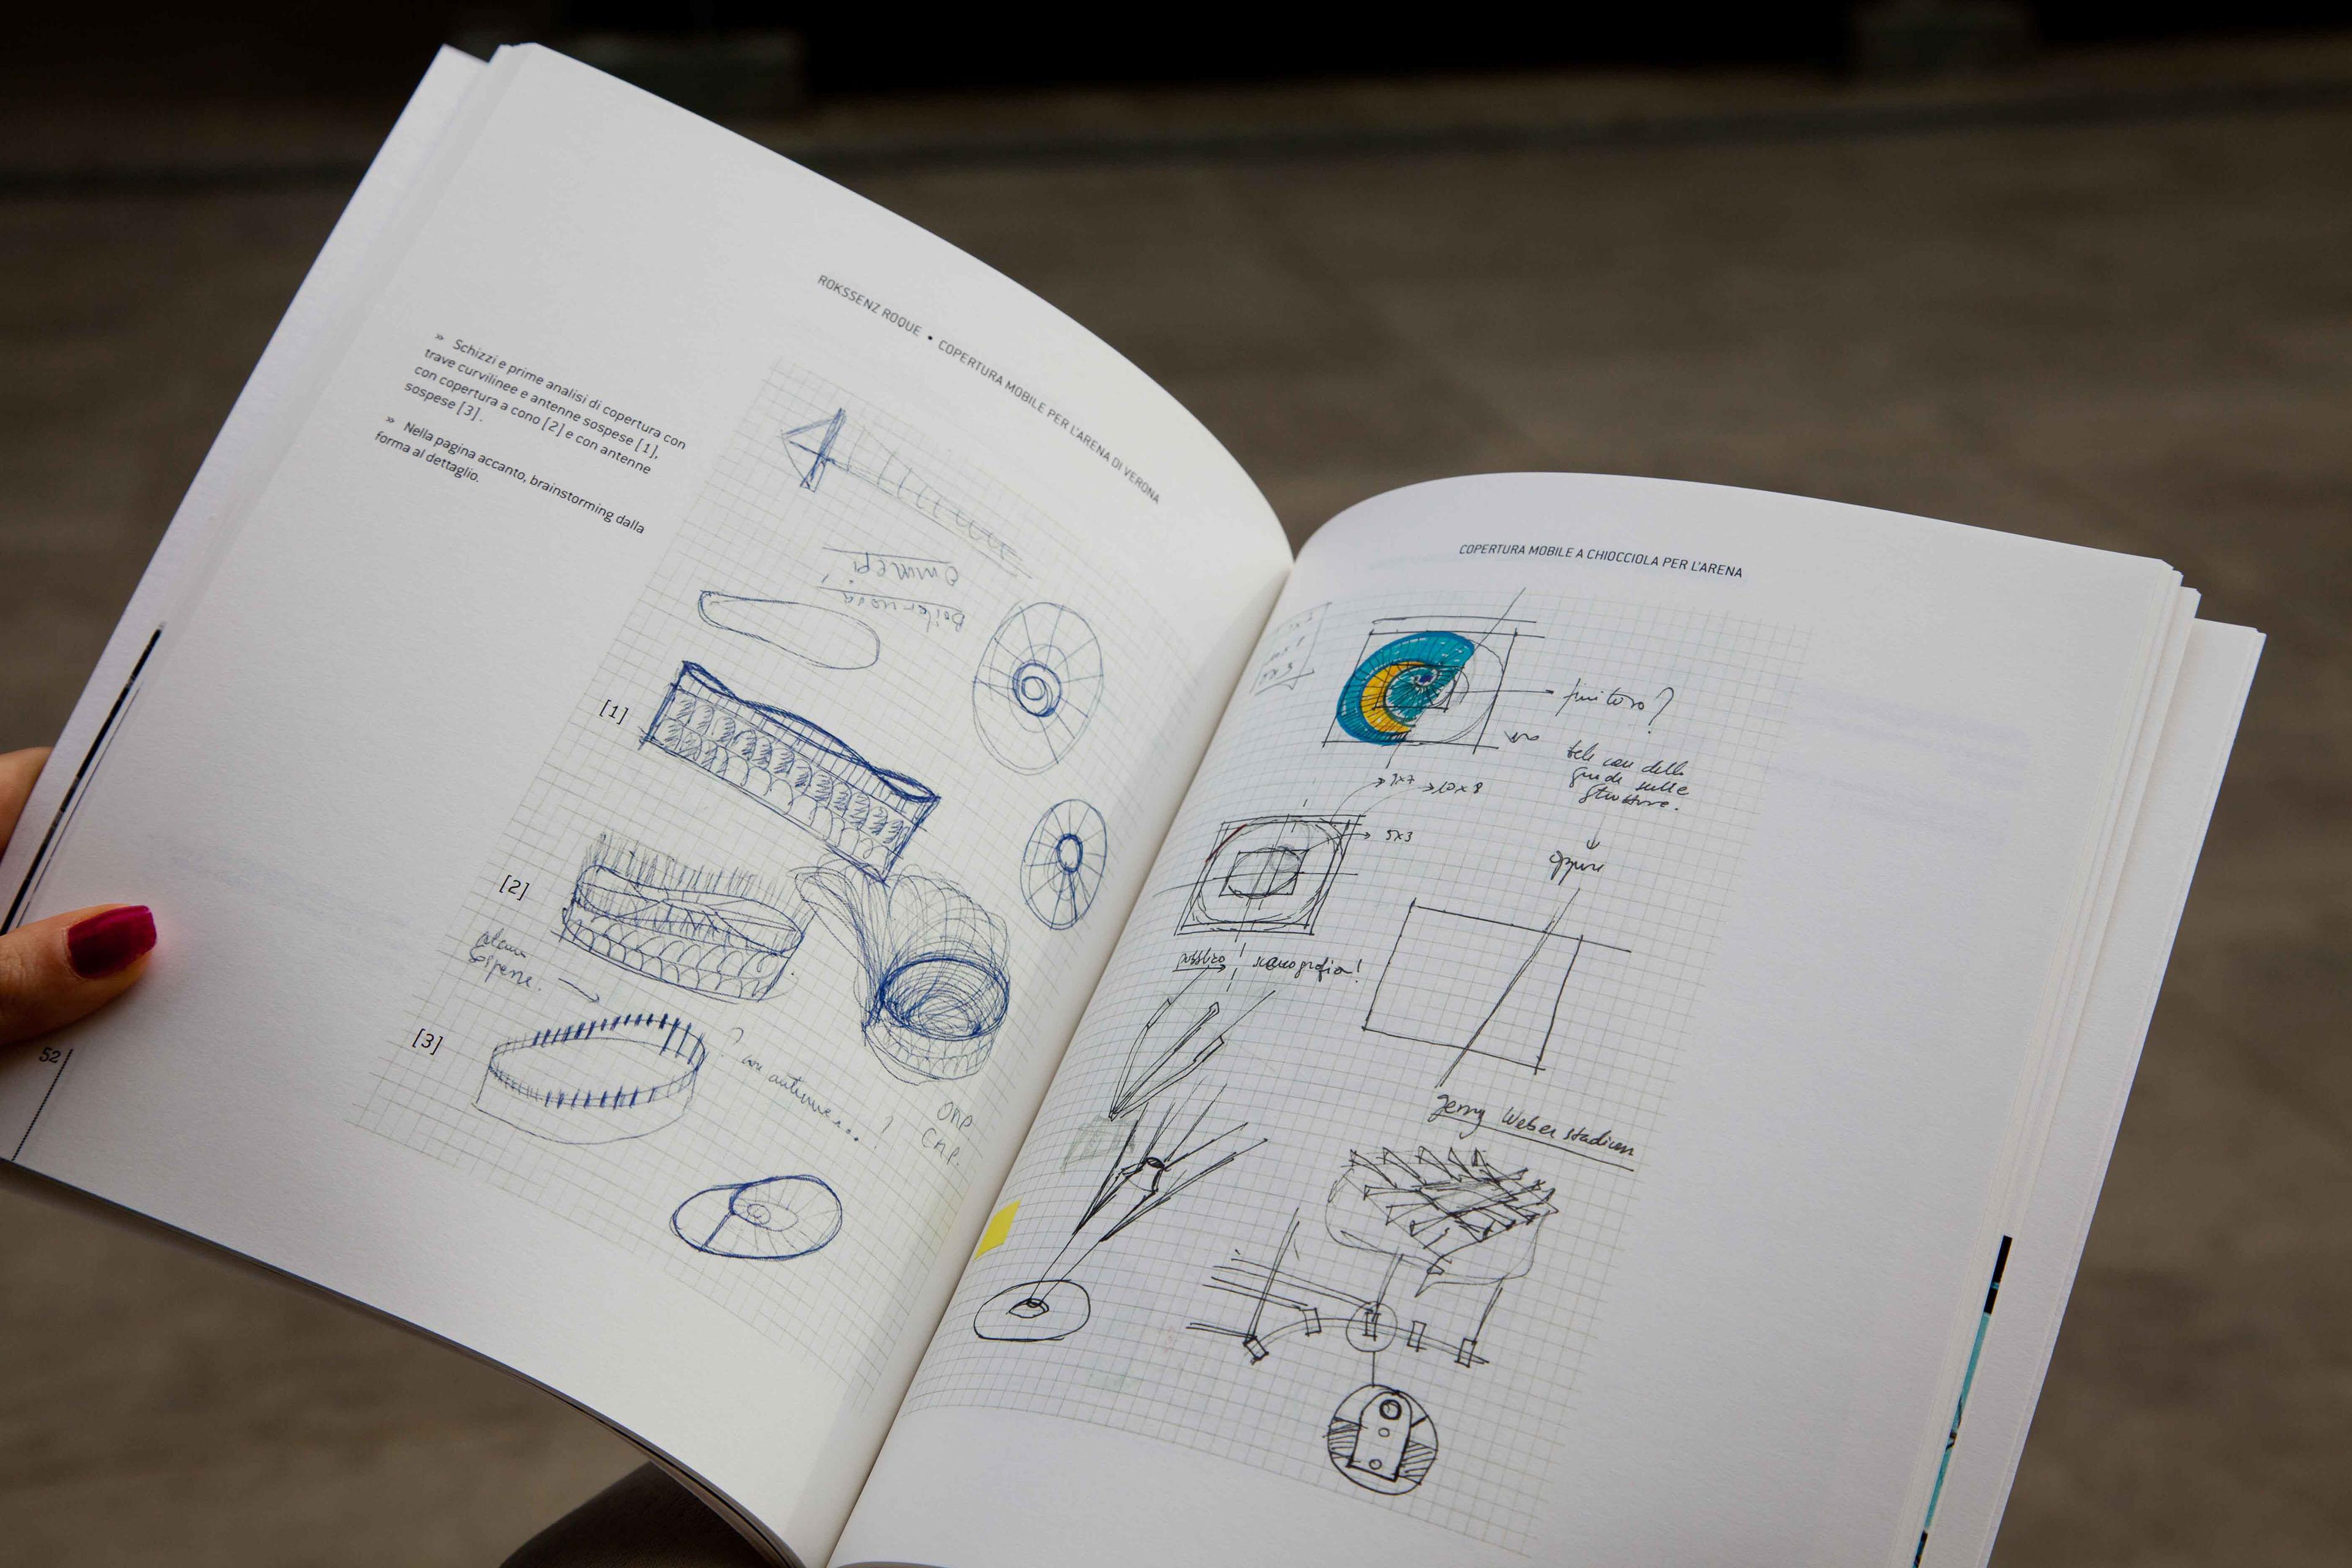 dissertation layouts